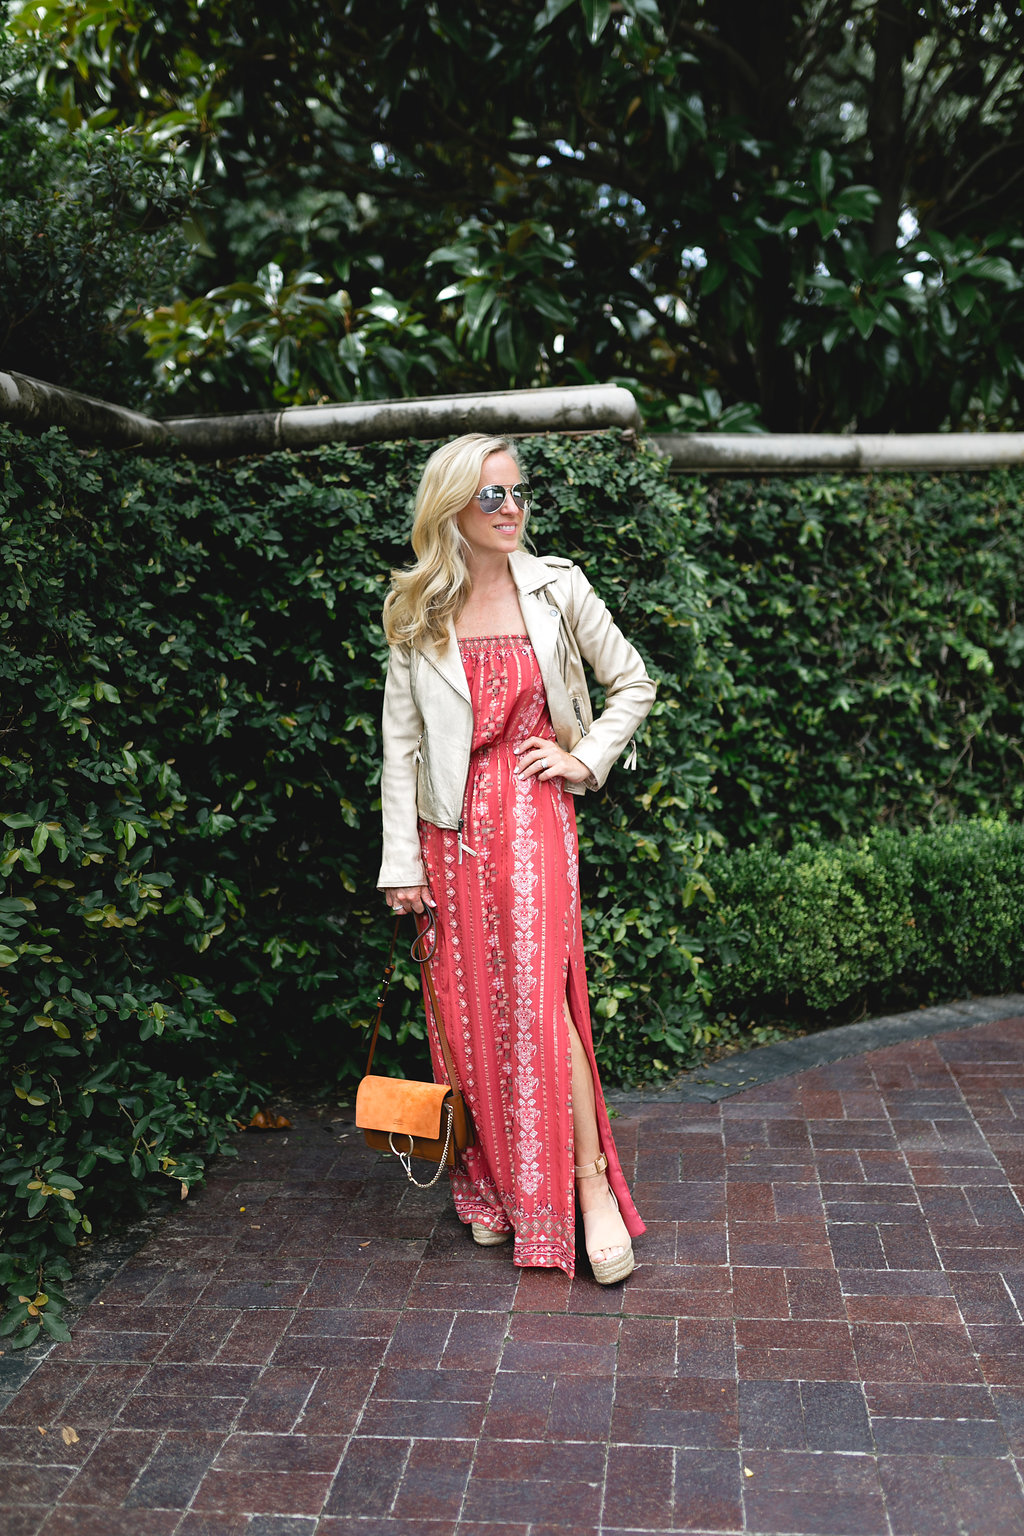 Alicia Wood, Dallas Lifestyle Blogger, Dallas Fashion Blogger, Joie Gold Leather Jacket, Joie Terracotta Maxi Dress, New Chloe Faye Bag, Chloe Espadrilles